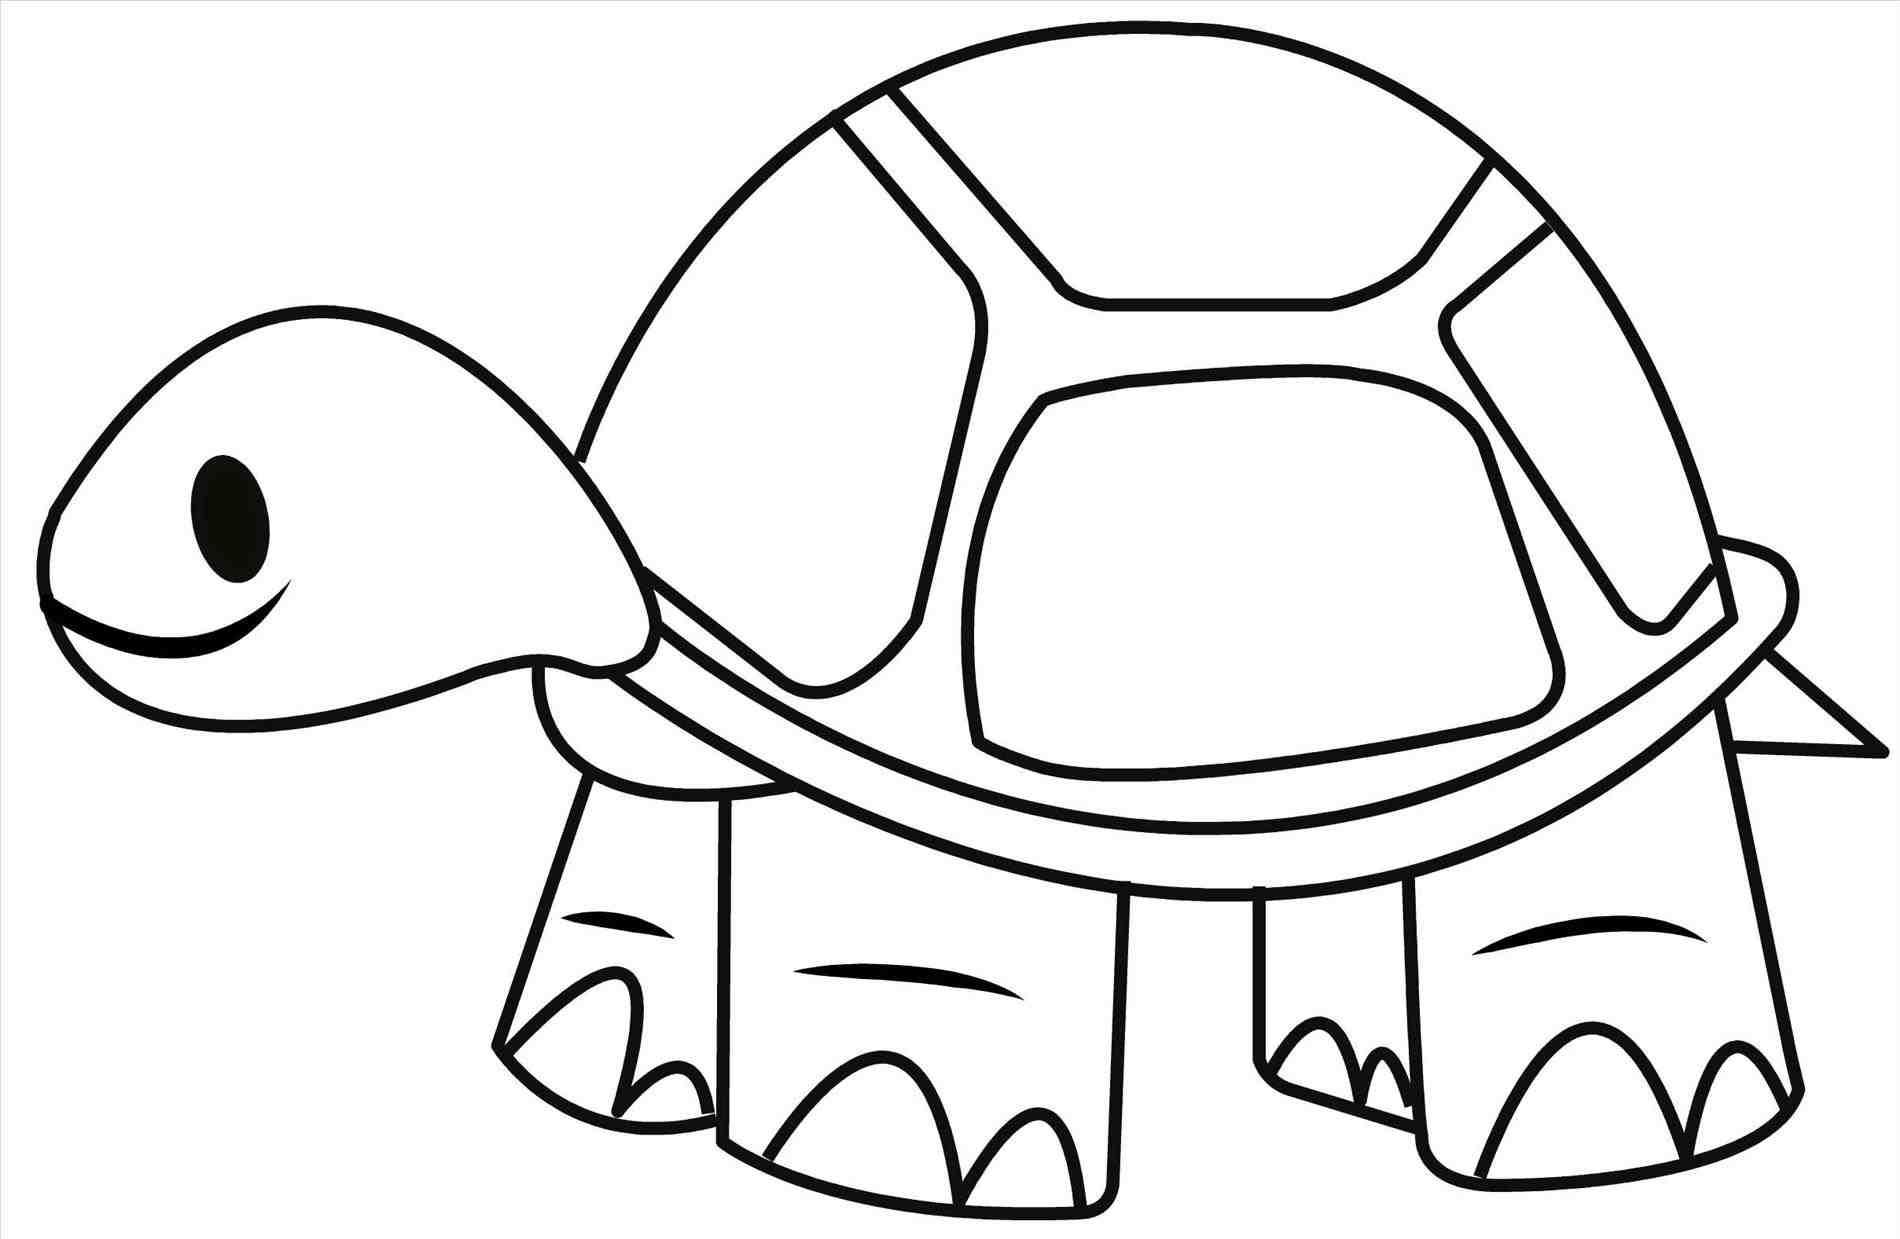 Line Drawing Turtle At Getdrawings